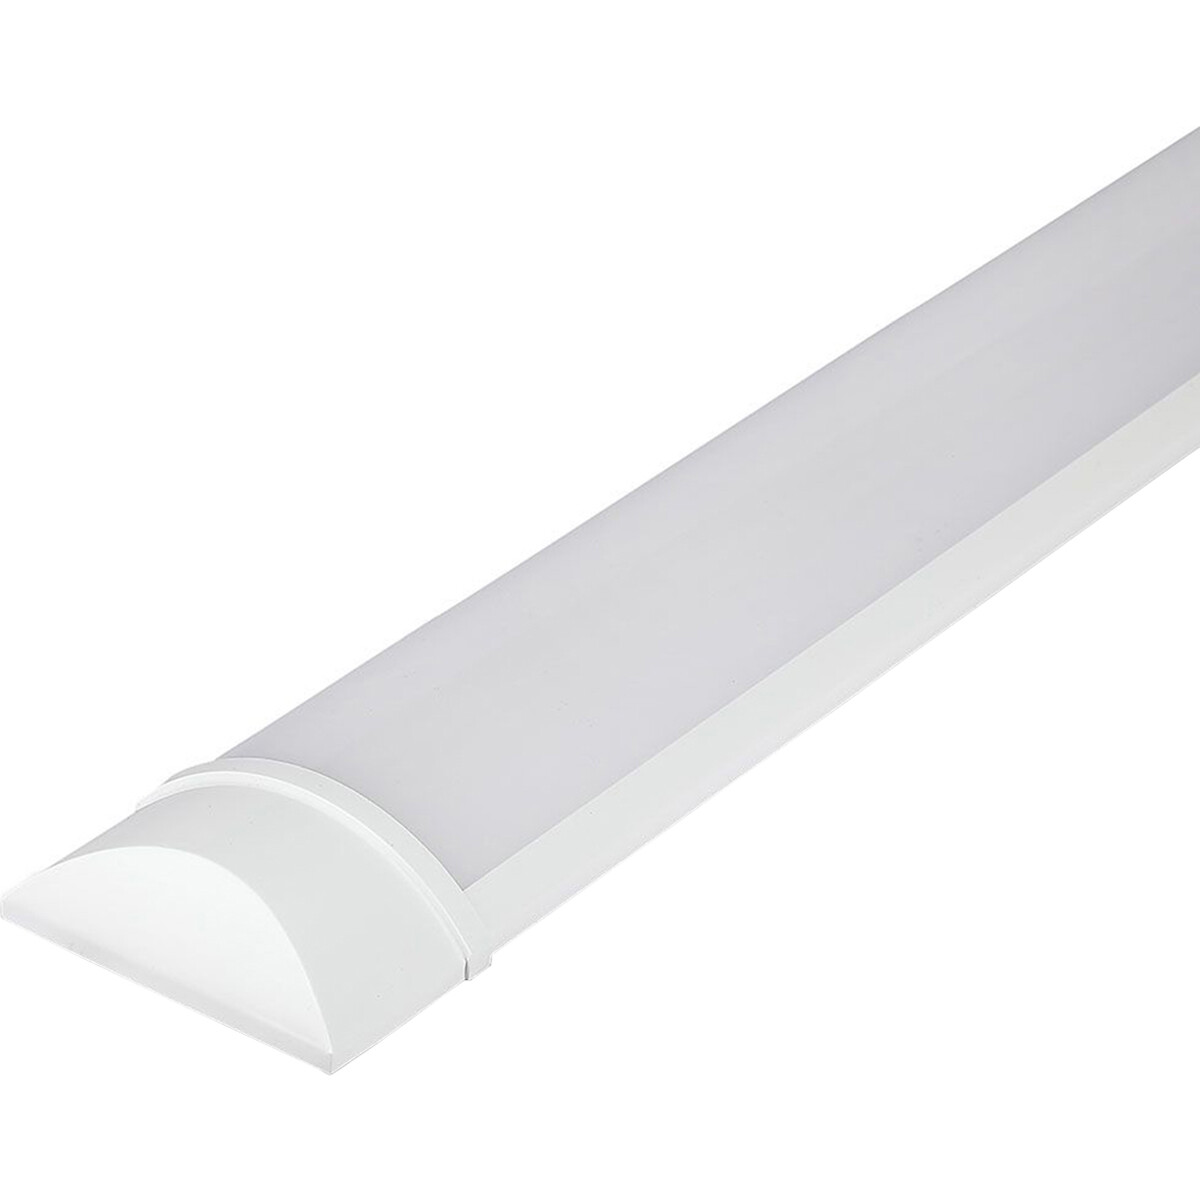 LED Balk - Viron Kilas - 15W High Lumen - Natuurlijk Wit 4000K - Mat Wit - Kunststof - 60cm